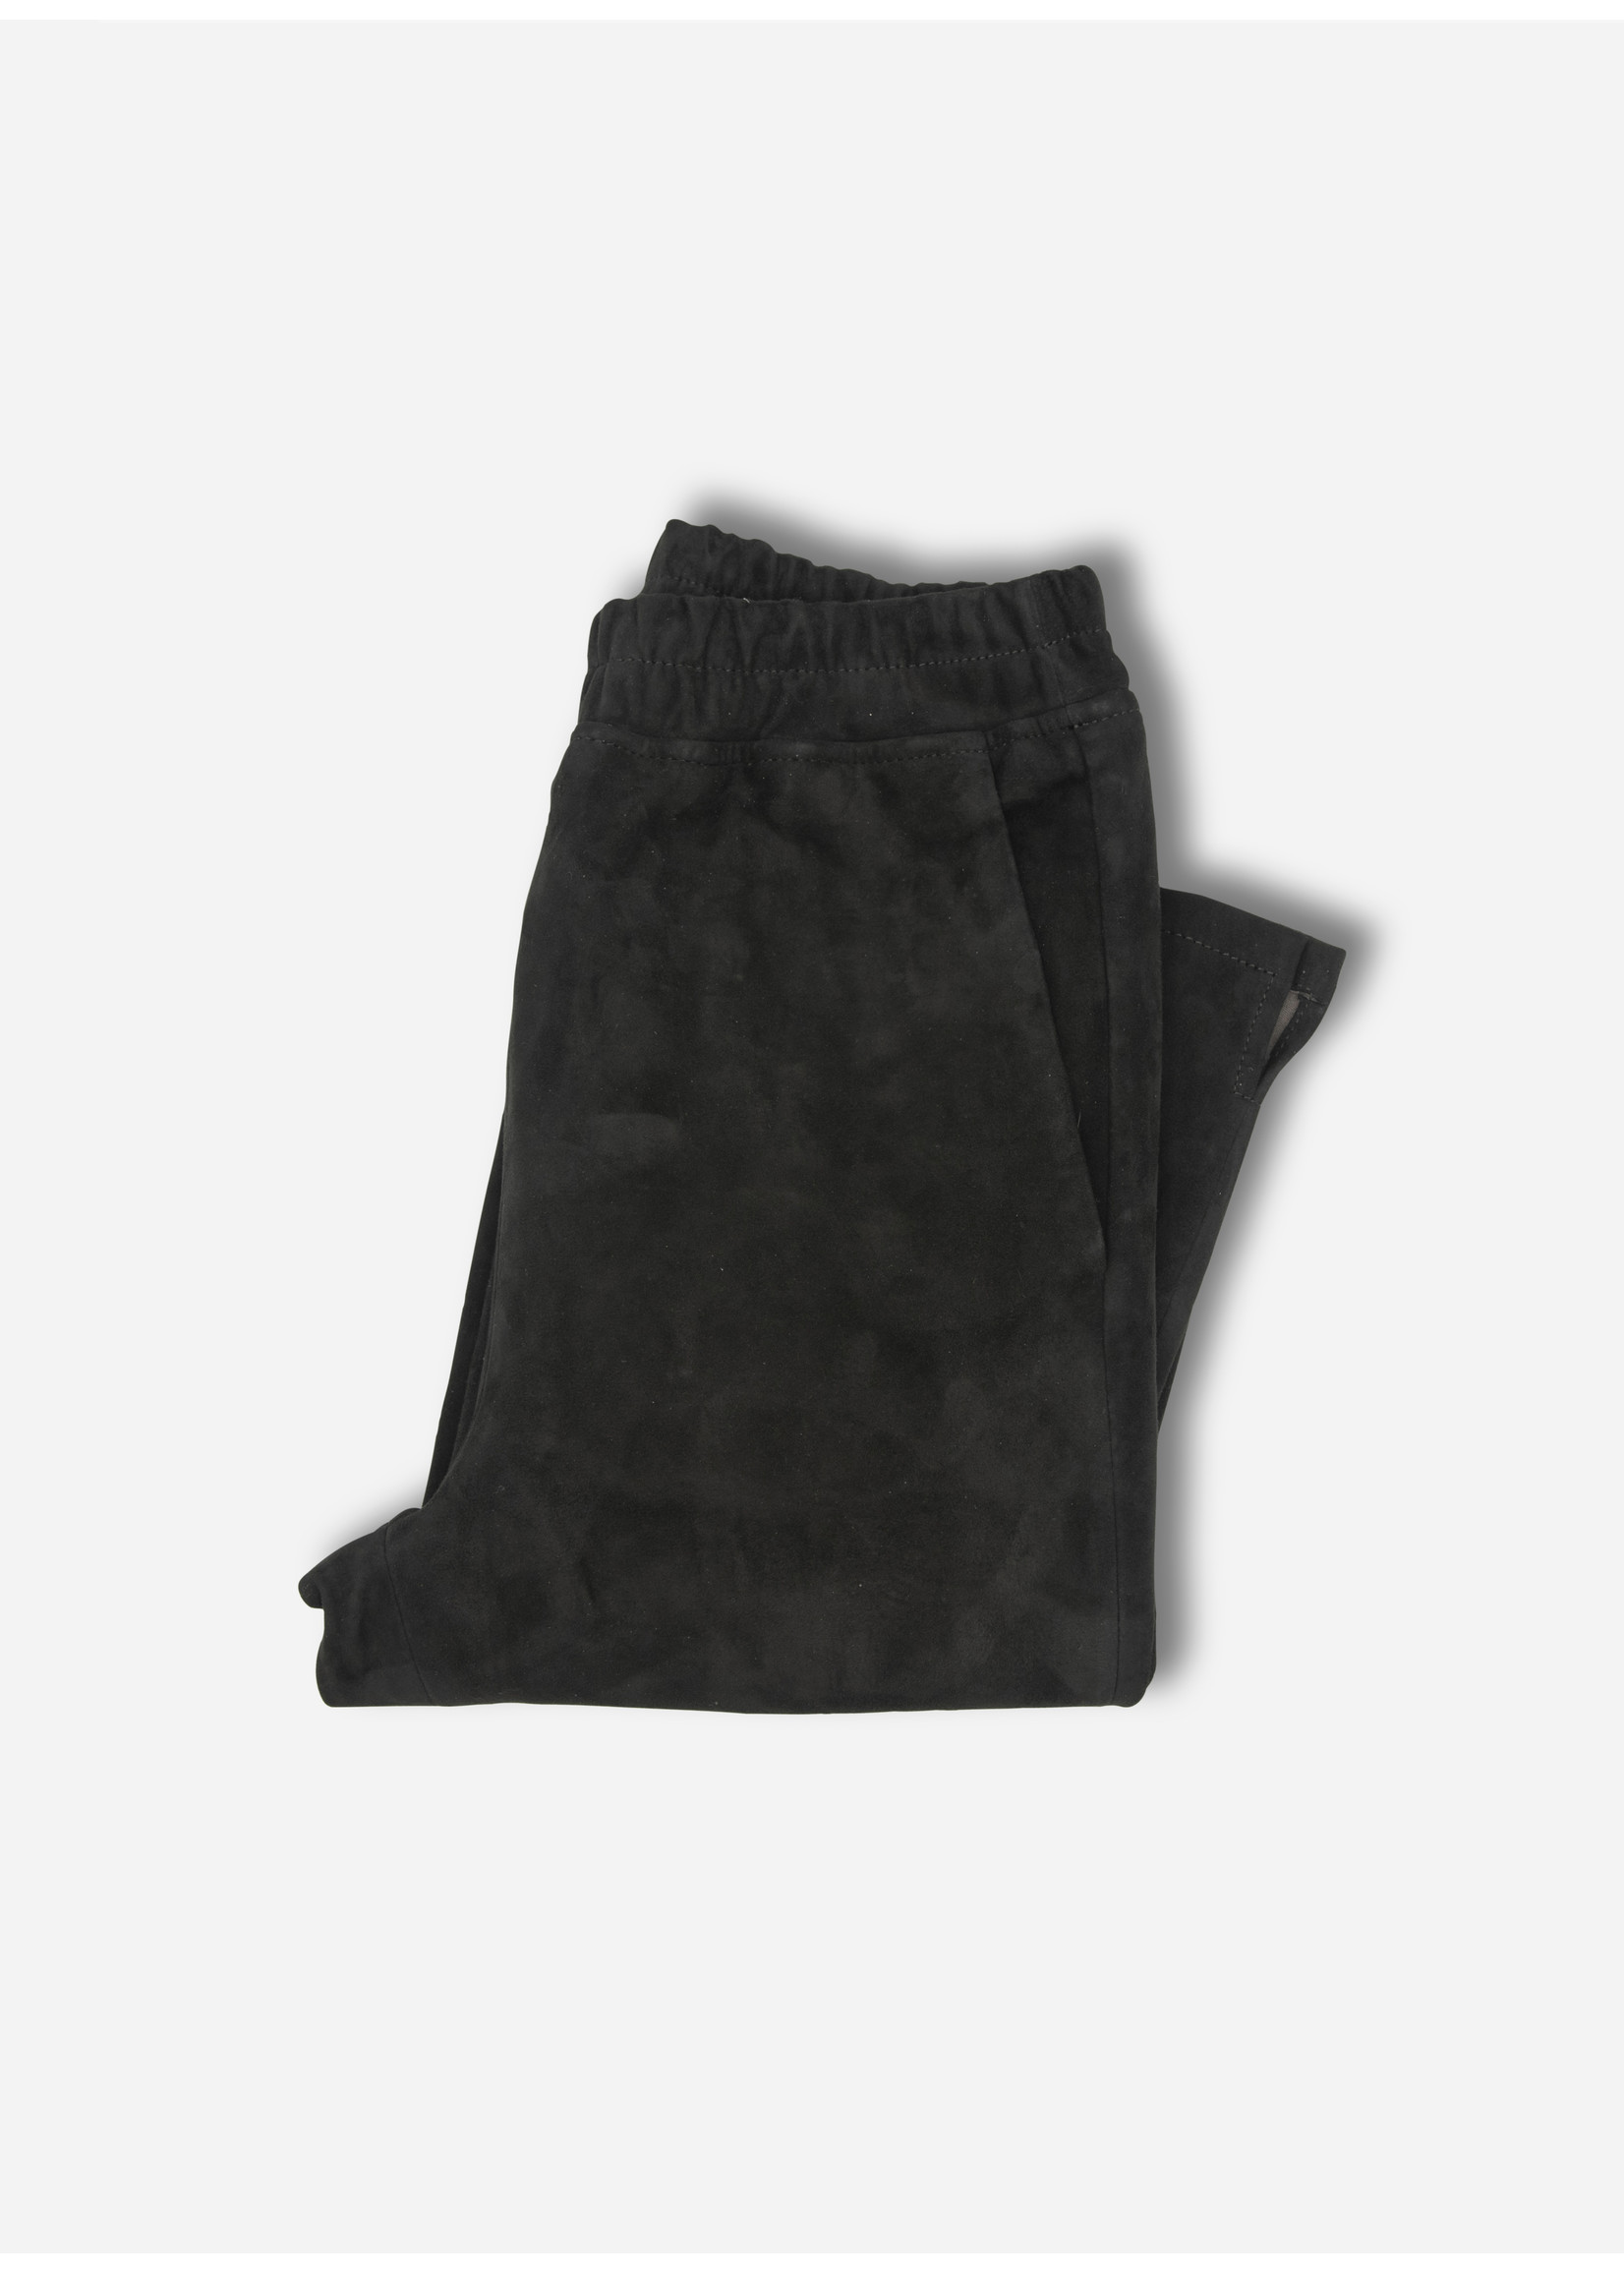 Arma Chatou stretch suede black